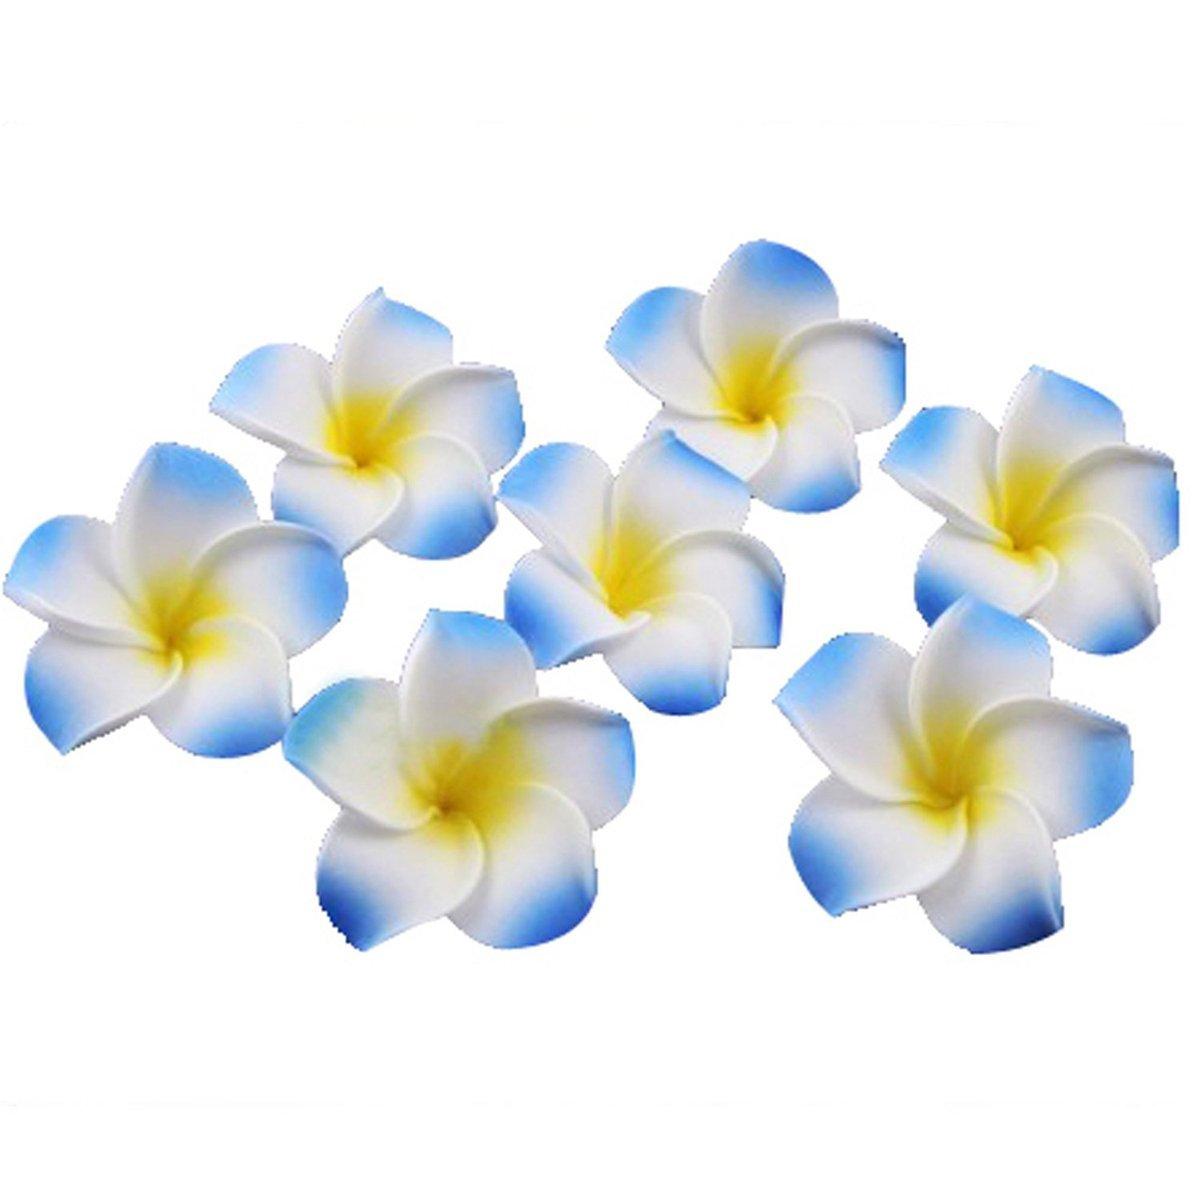 Buy Winomo 100pcs Artificial Flowers Plumeria Hawaiian Foam